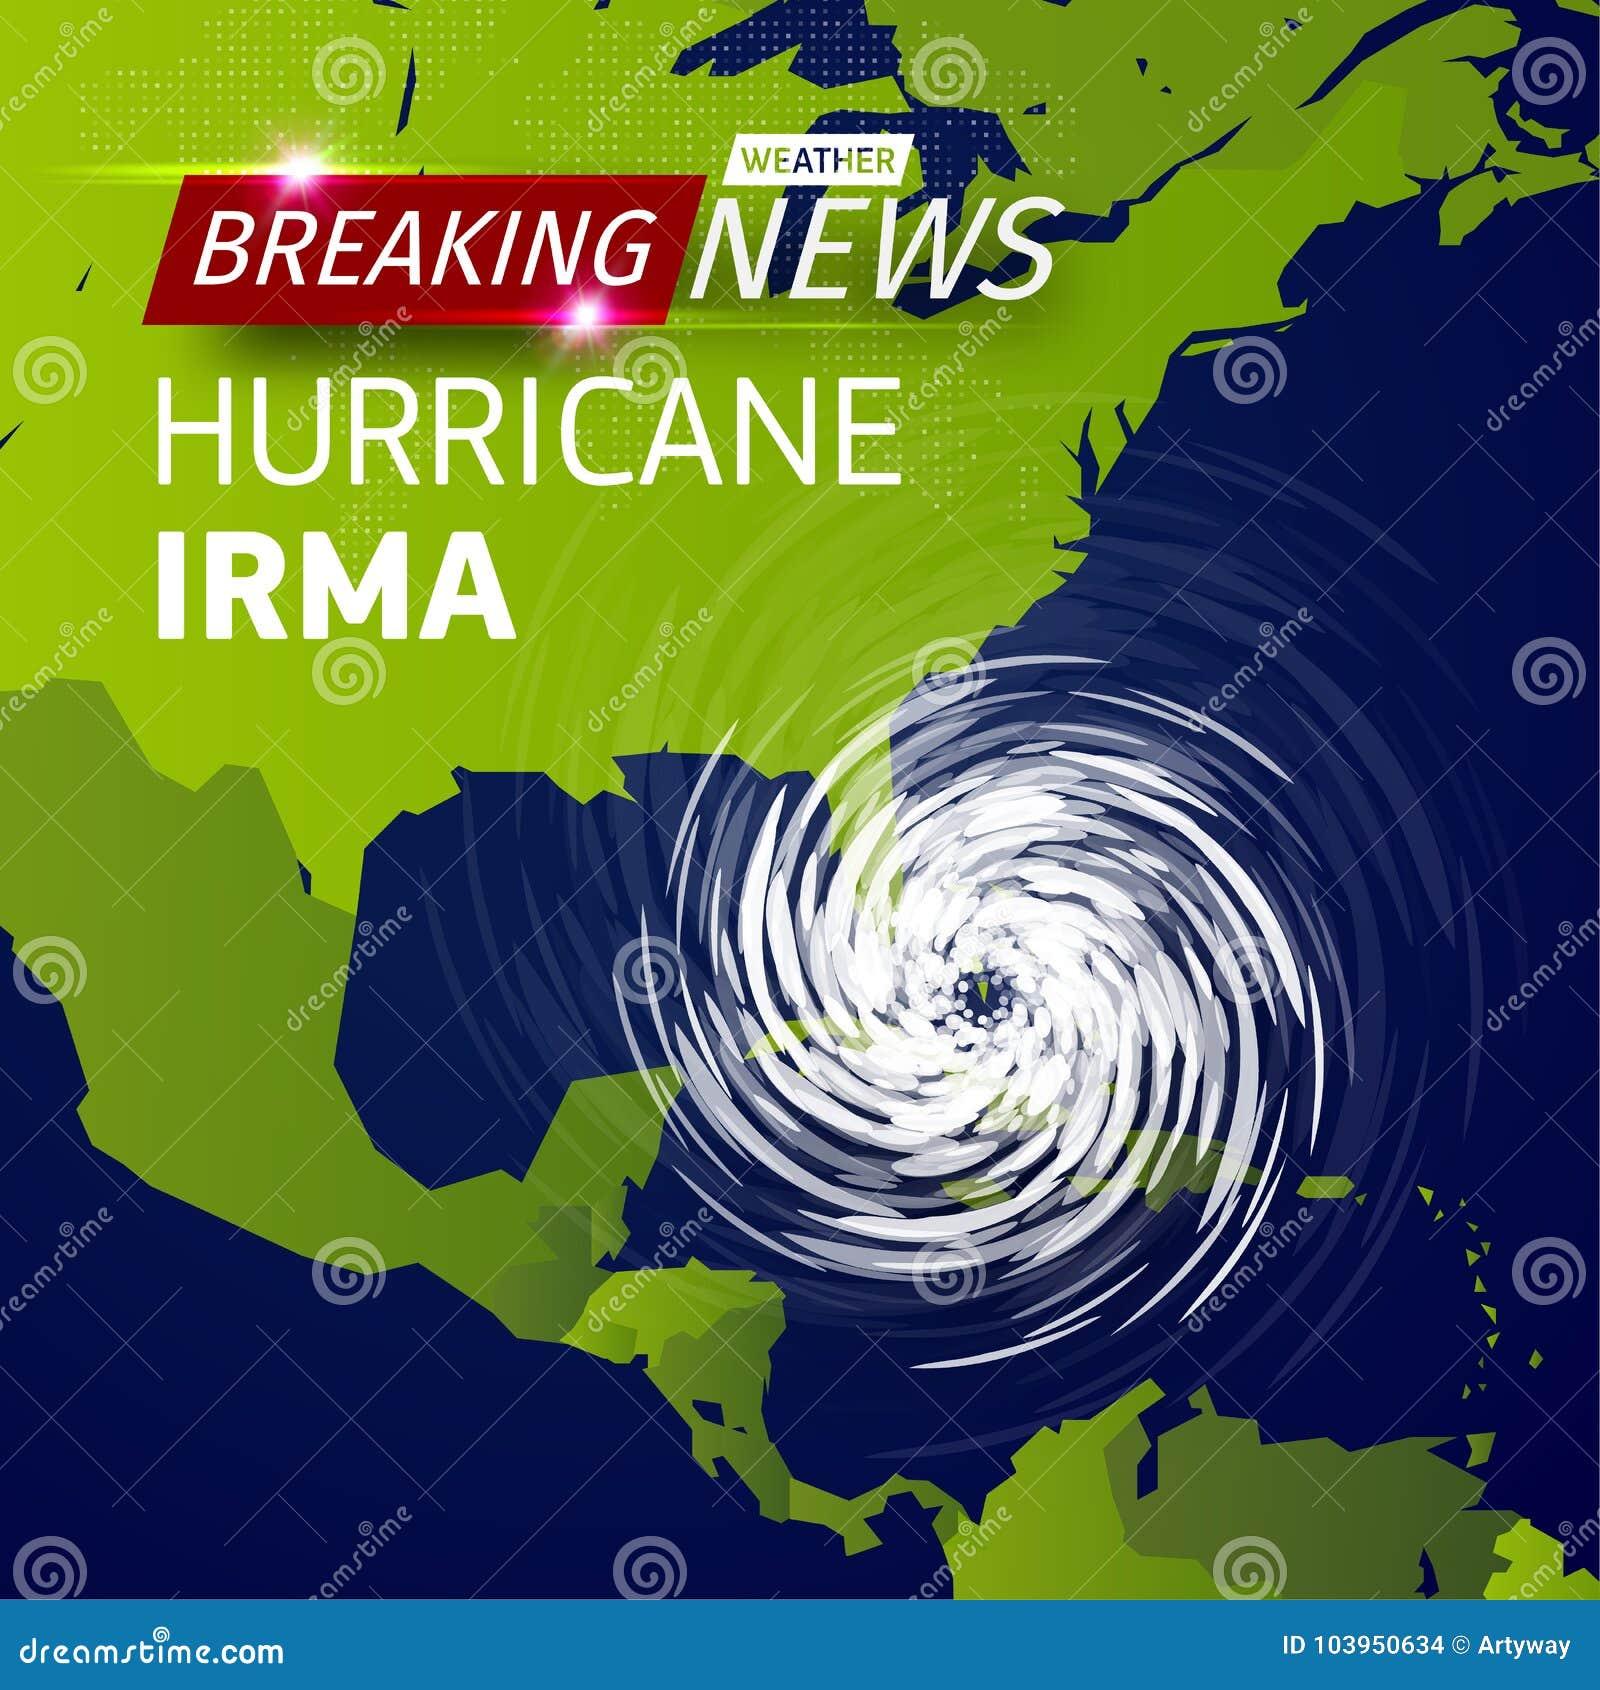 Breaking News Tv Realistic Hurricane Cyclone Vector Illustration On